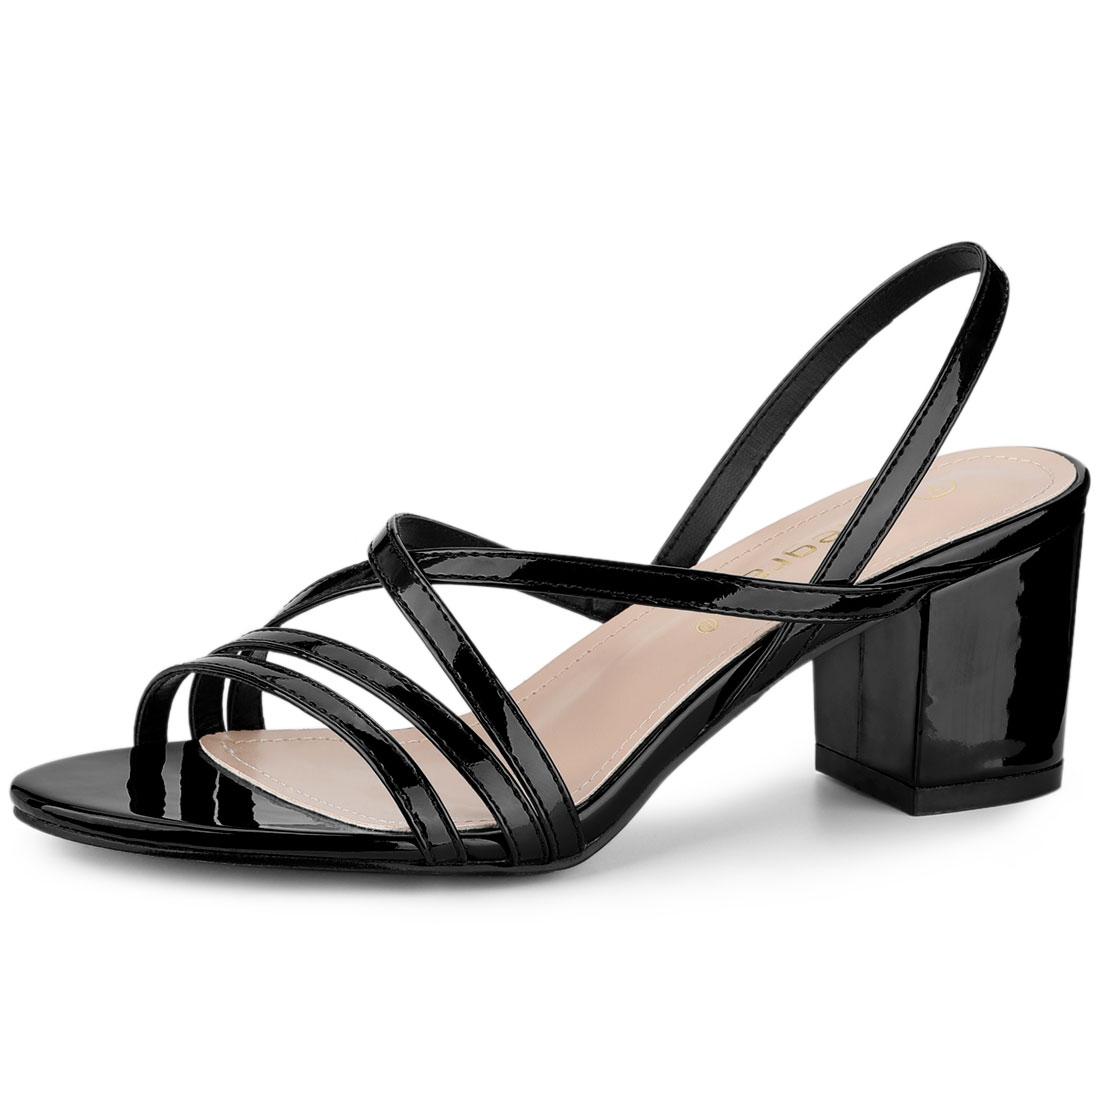 Allegra K Women's Strappy Slingback Chunky Heels Sandals Black US 9